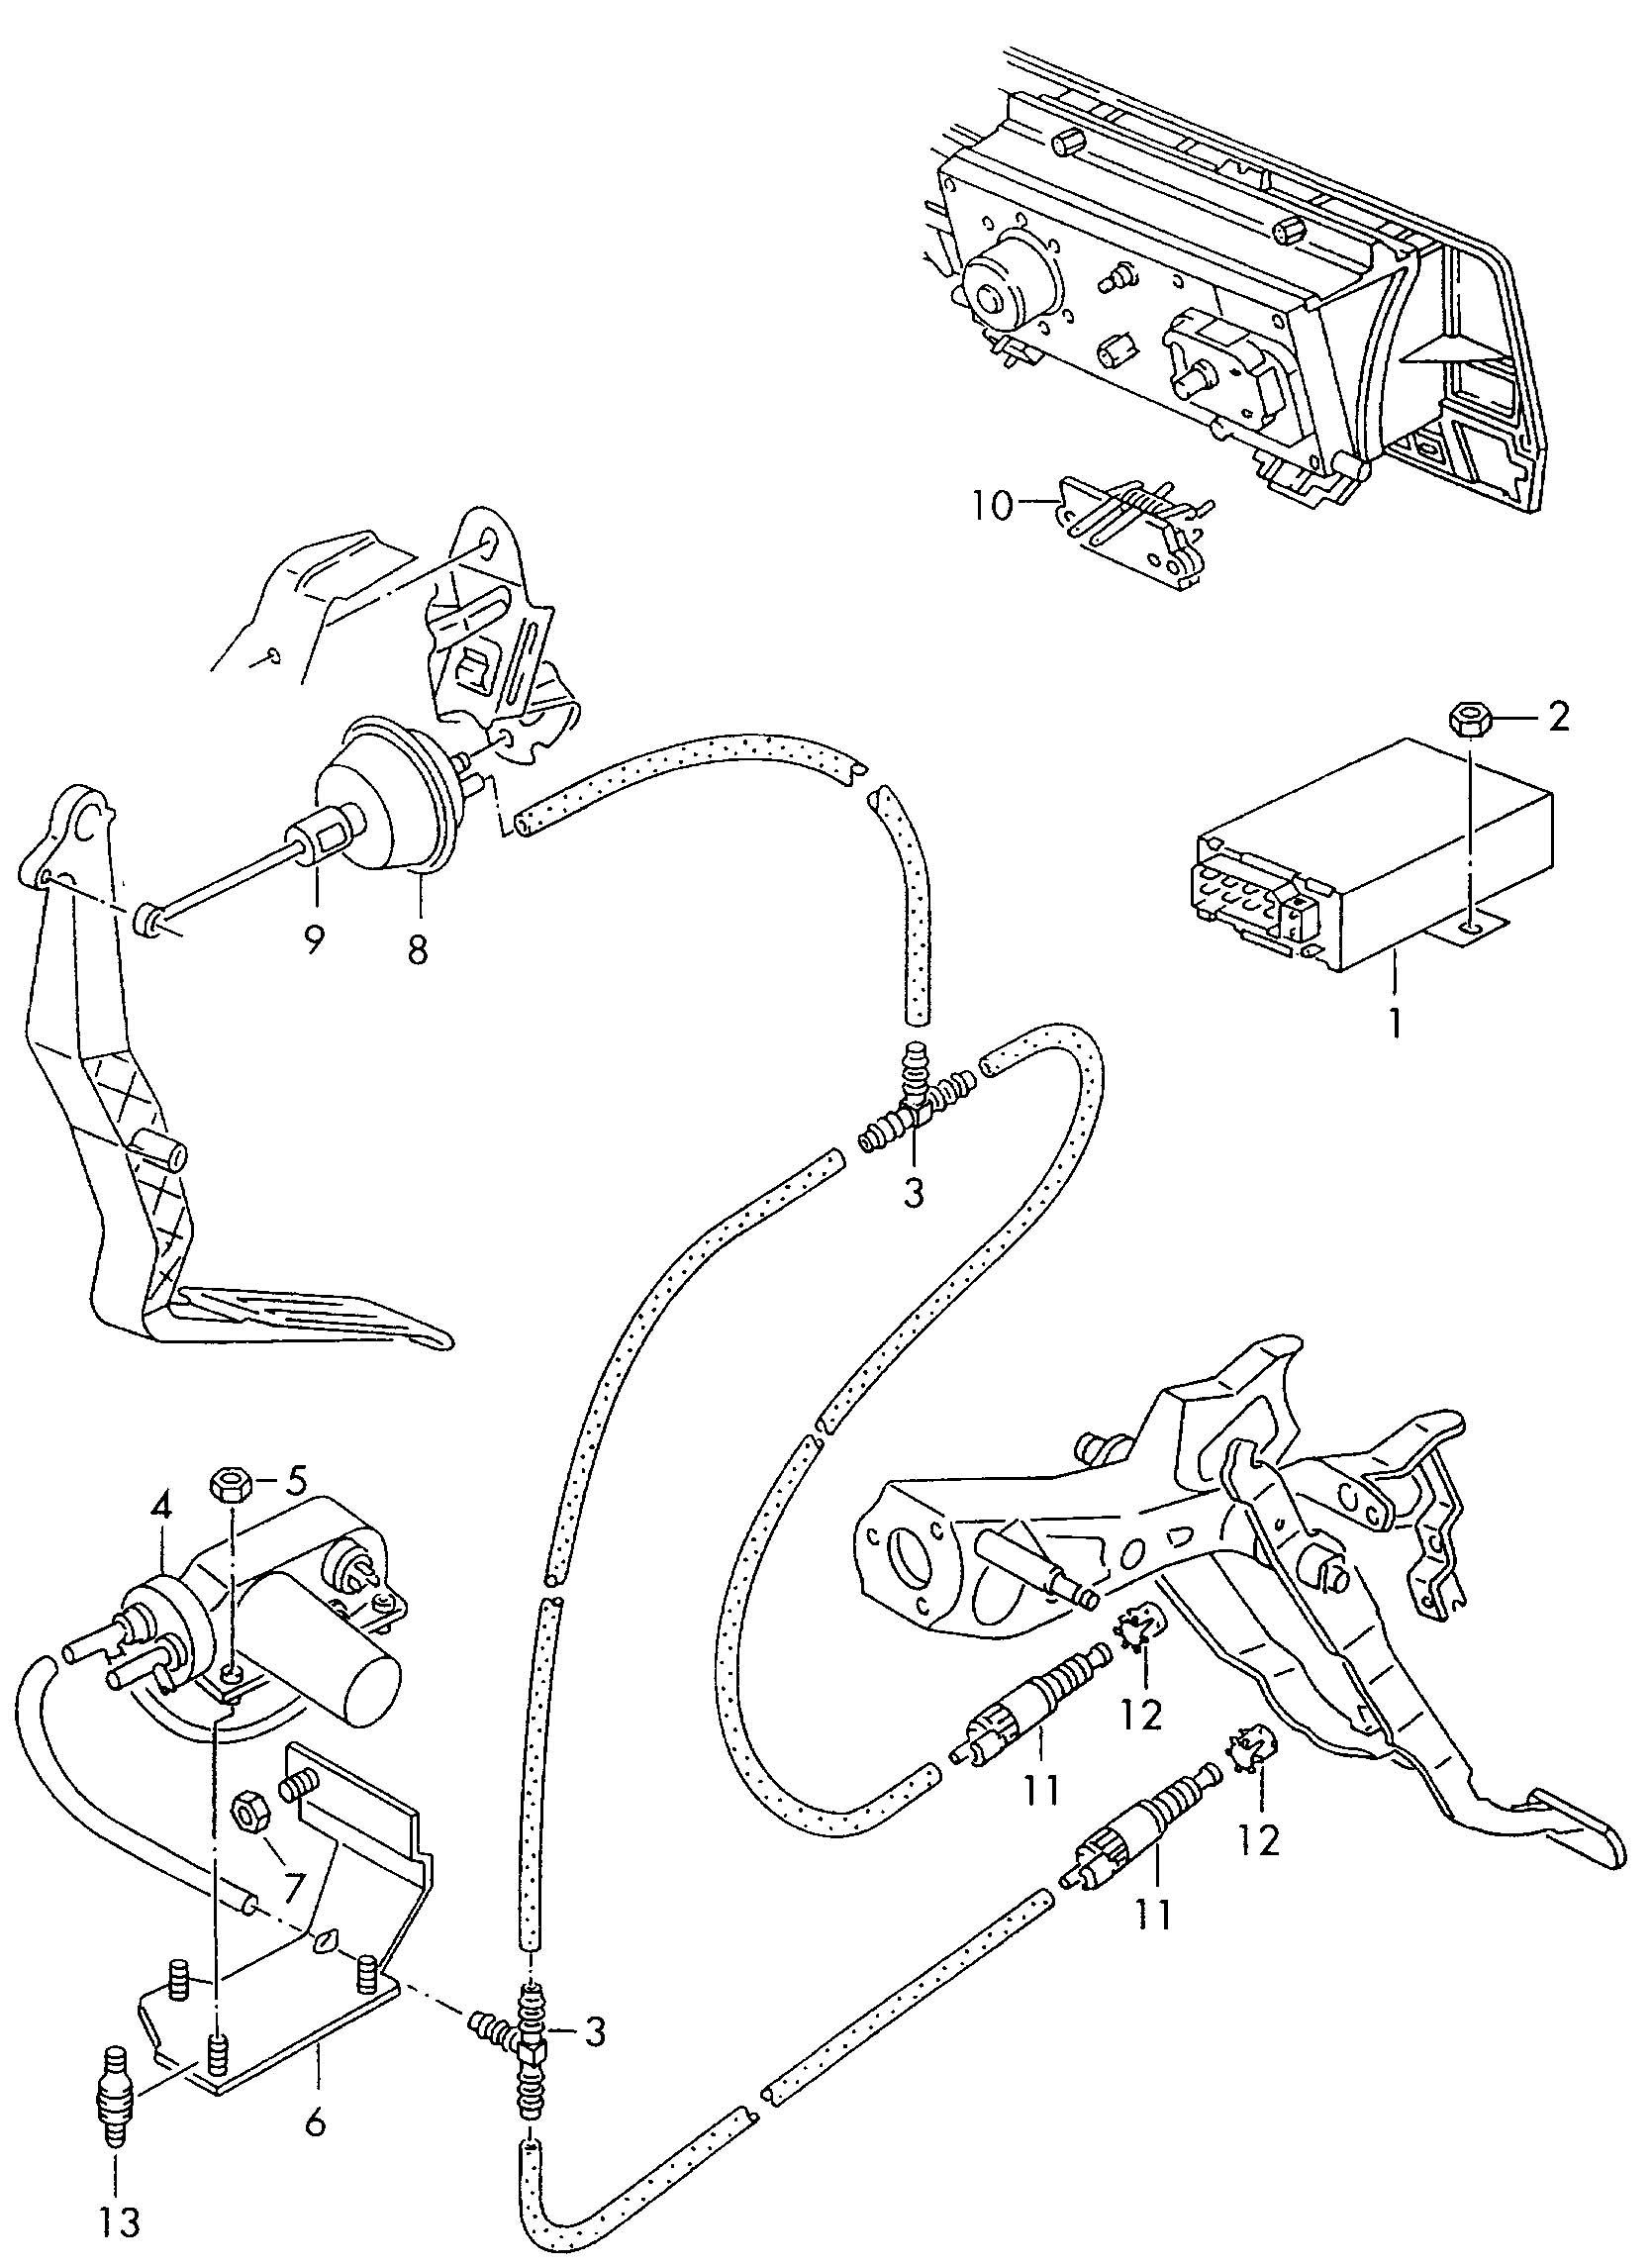 Ecu Wiring Diagram Vw T4. Diagram. Auto Wiring Diagram